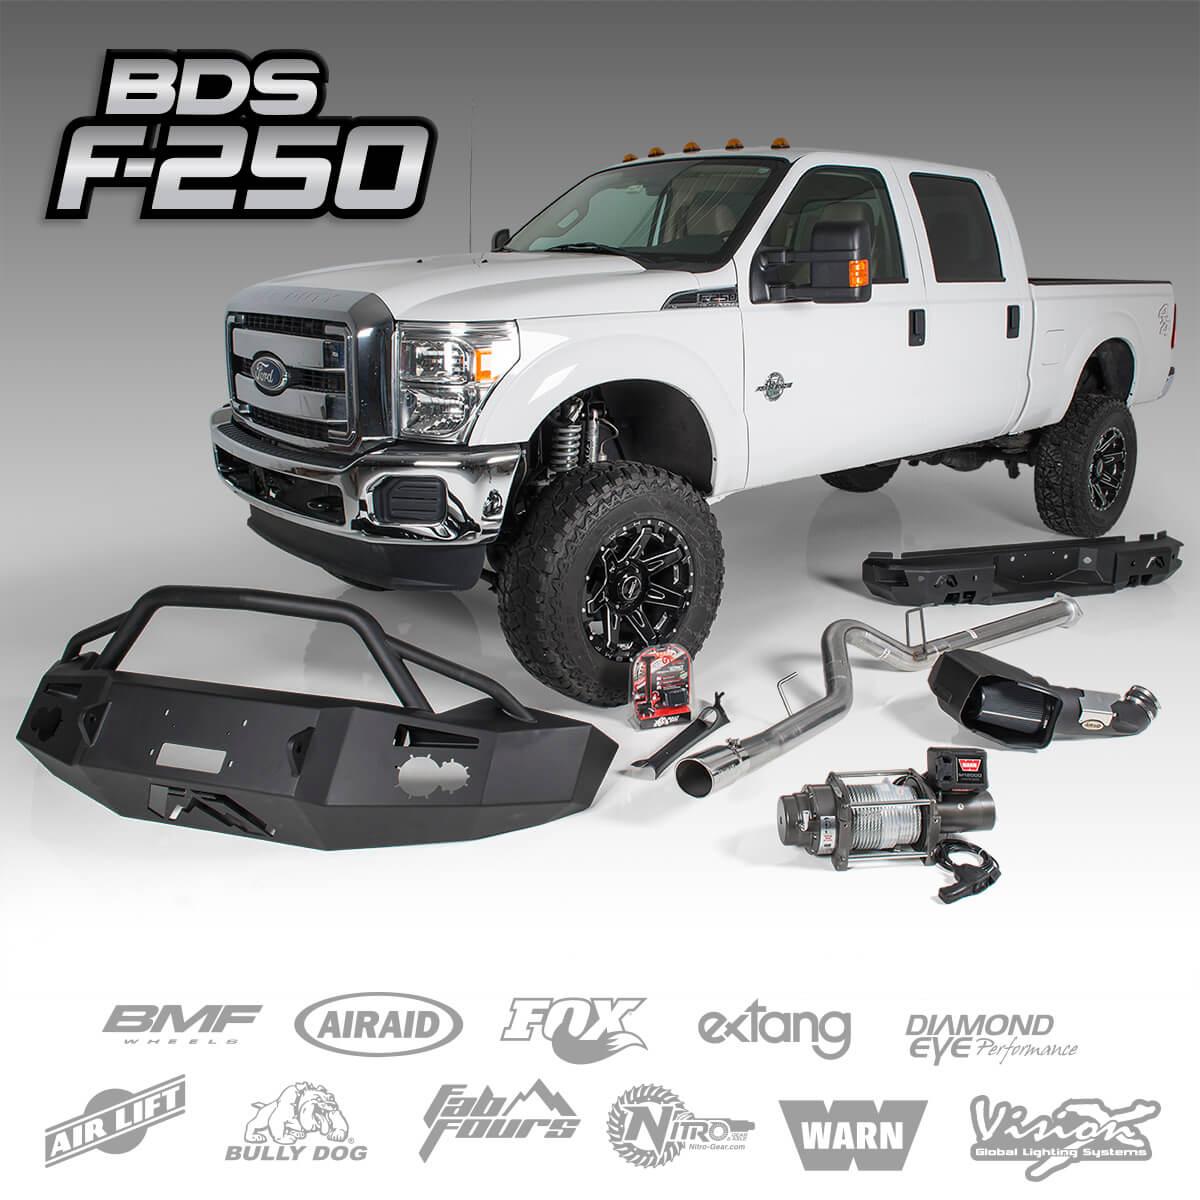 BDS F250